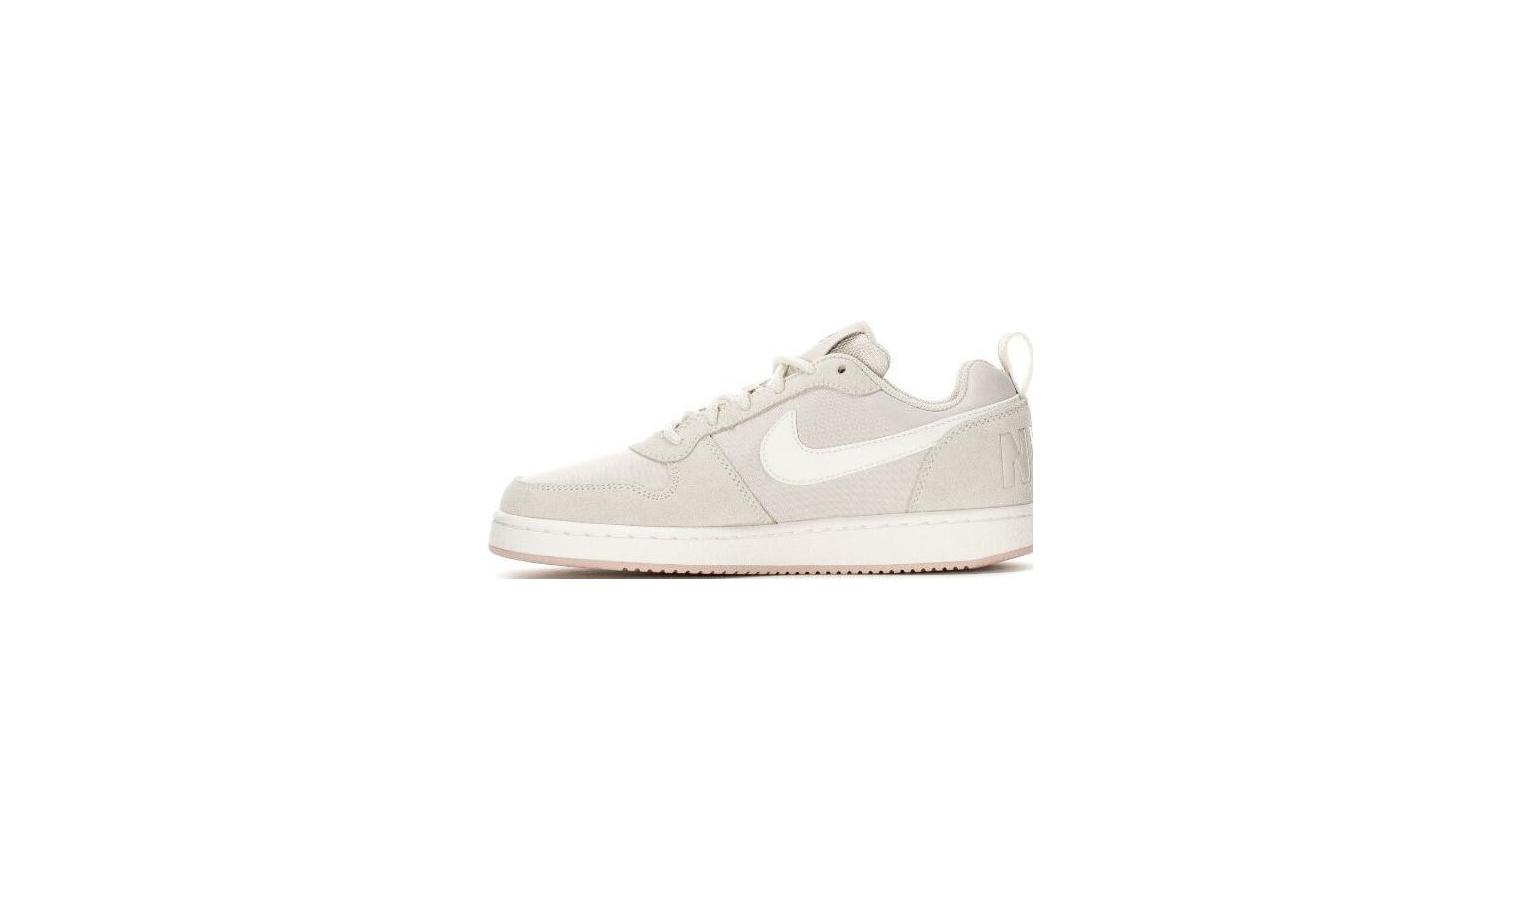 ... Dámské tenisky Nike COURT BOROUGH LOW PREMIUM W béžové. Sleva a1b78adab99